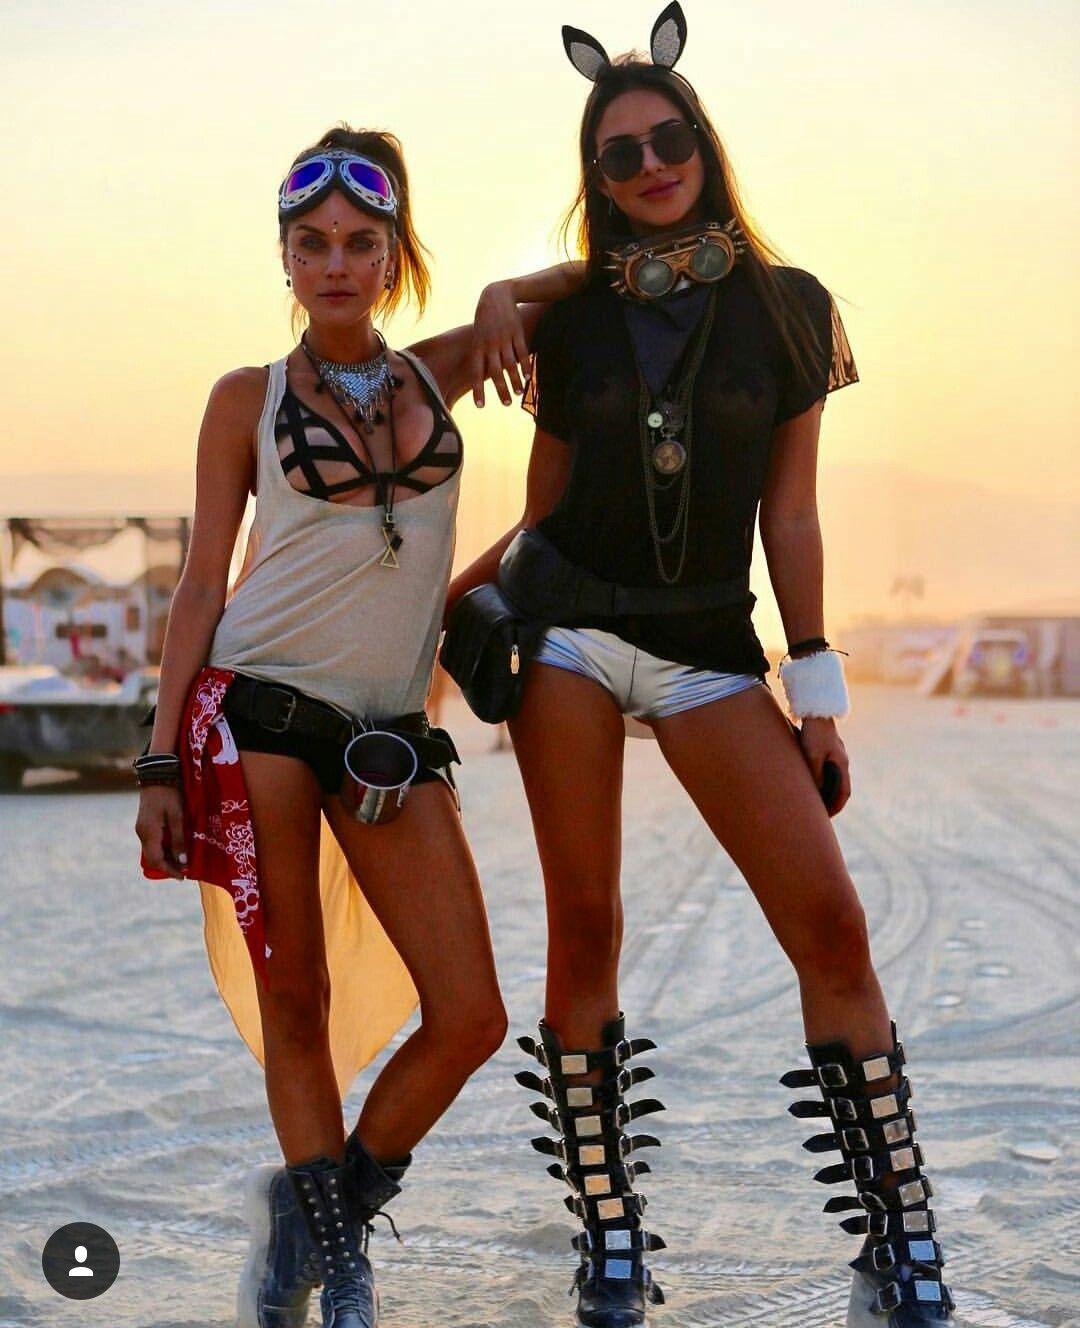 Girls burning nude rave